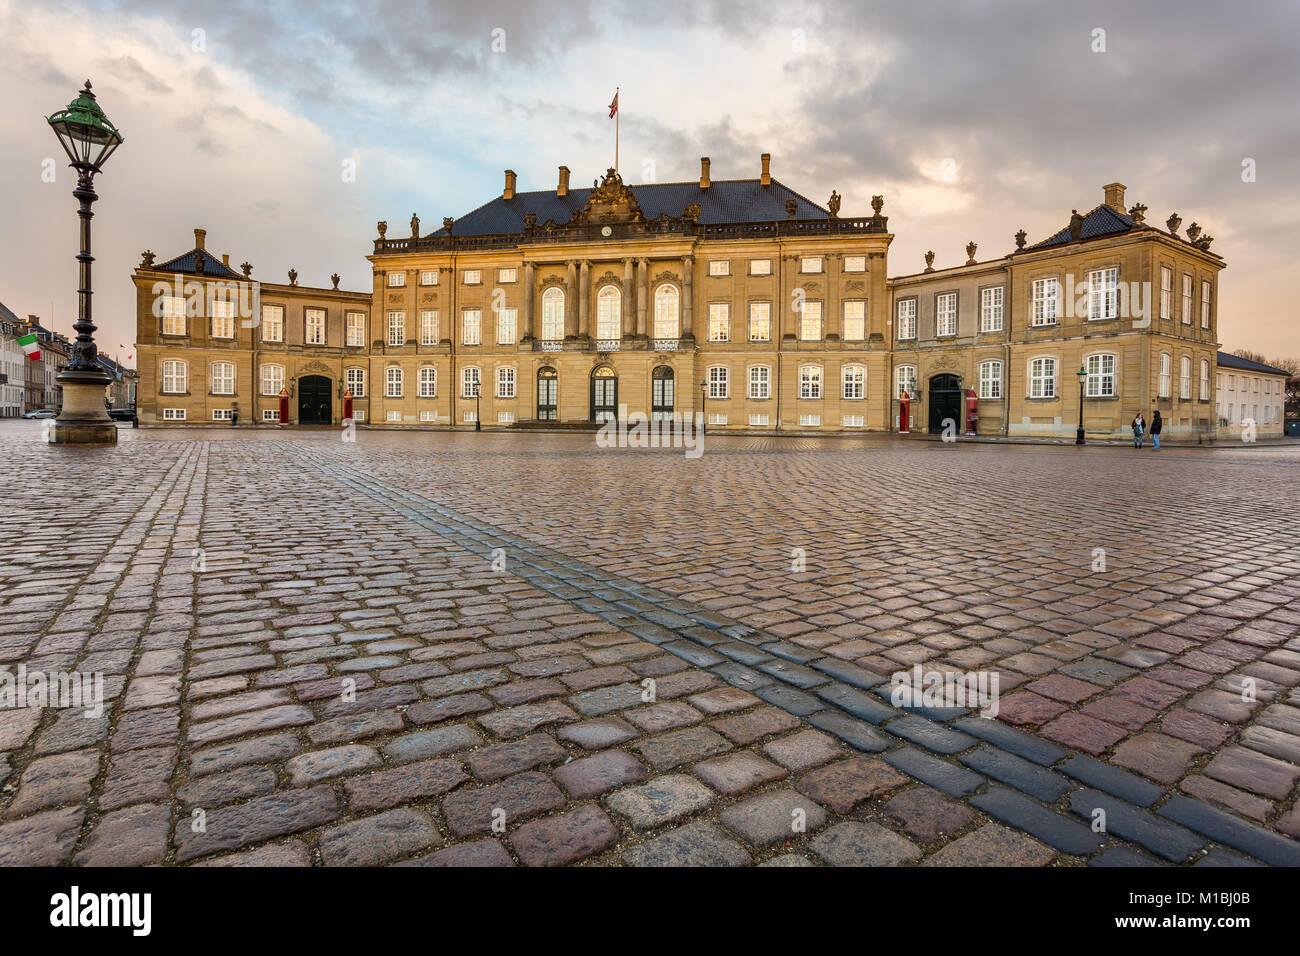 COPENHAGEN, DENMARAK- February 02, 2017: Frederick VIII's Palace in Amalienborg. Home of the Danish royal family. - Stock Image